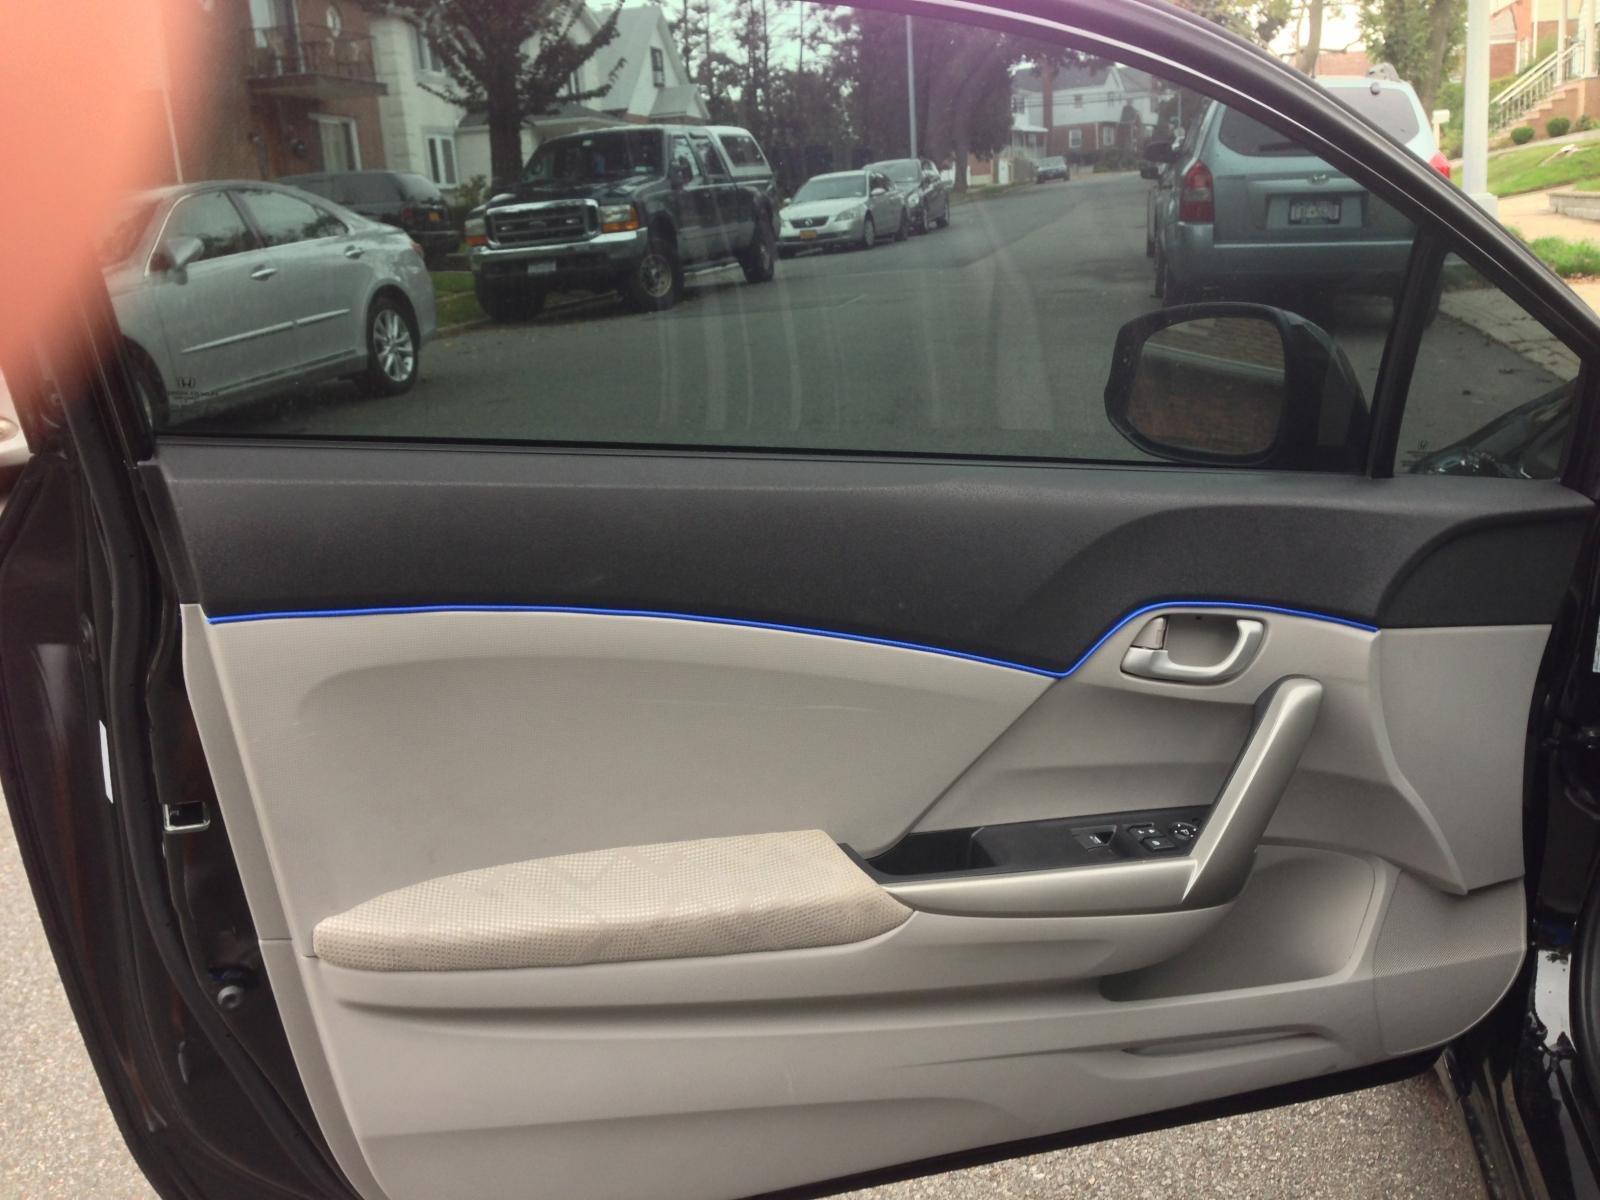 Car interior piping -  Interior Door Piping Welt Trimming Img_0036 Jpg